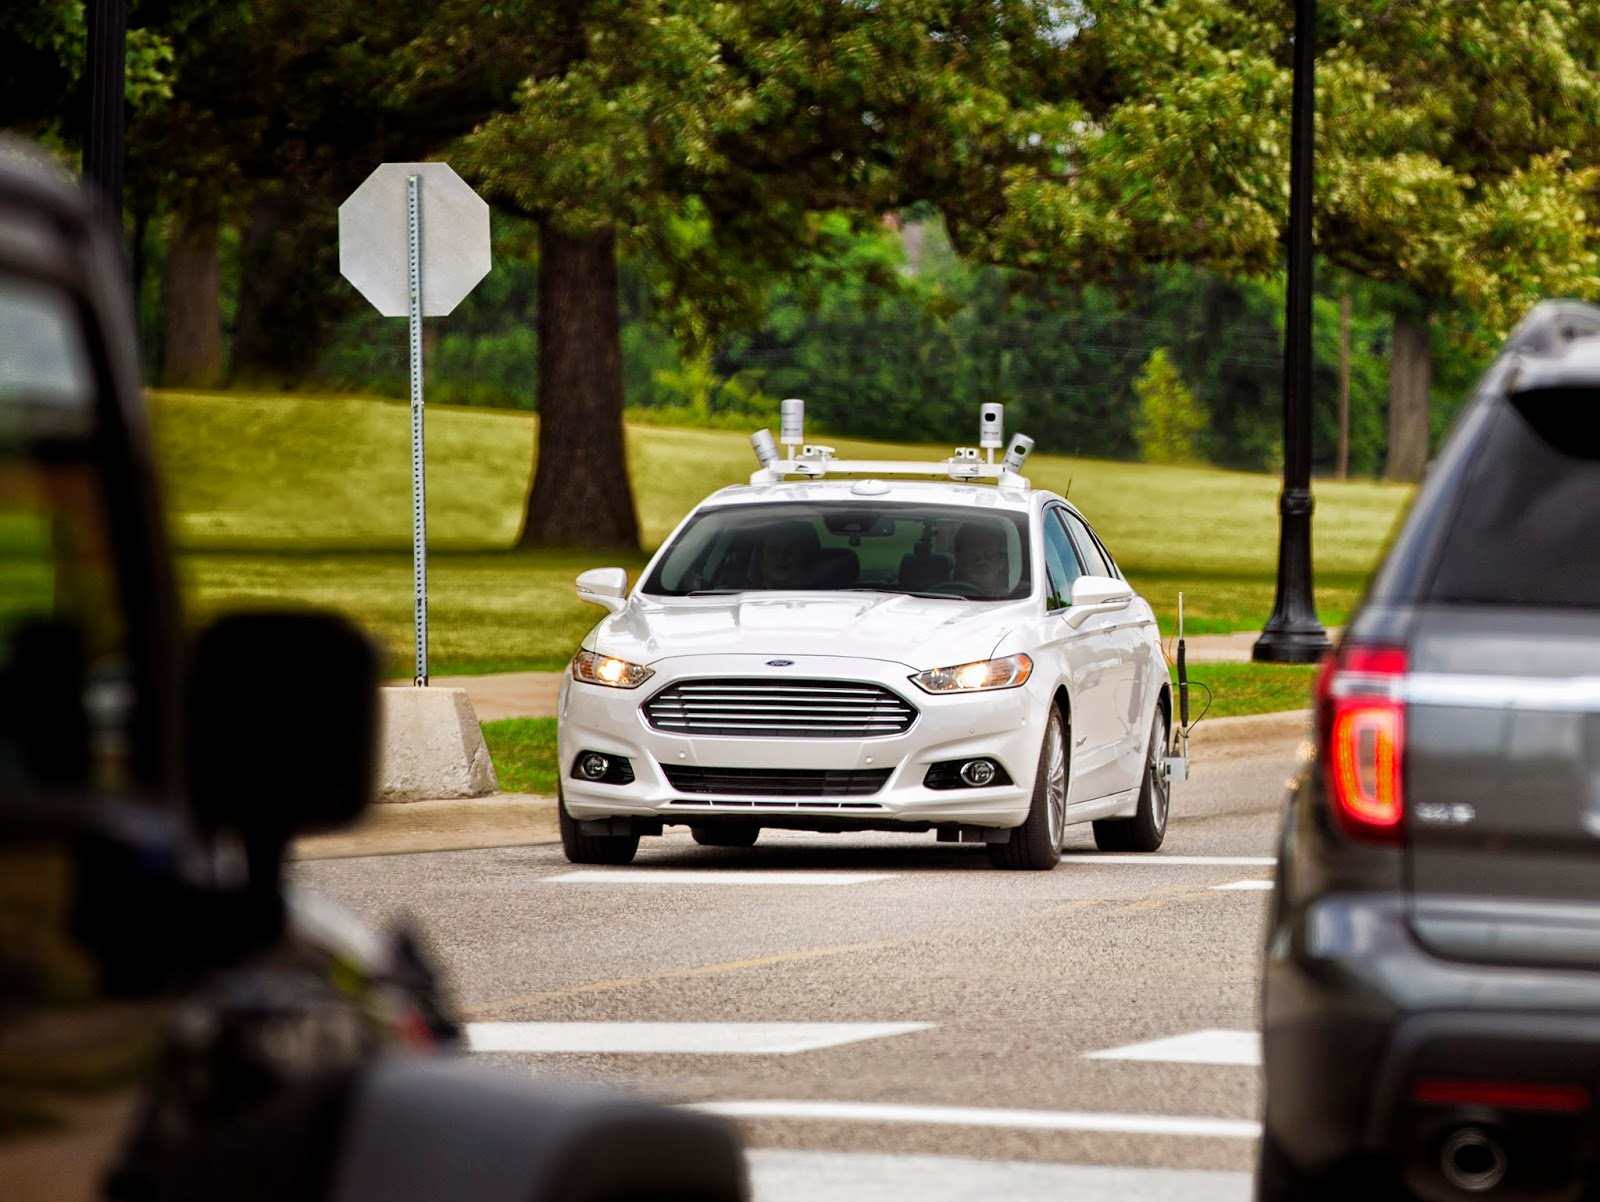 Ford Fusion AV Public Road 1 Η Ford στοχεύει να βγάλει σε μαζική παραγωγή ένα πλήρως αυτόνομο όχημα το 2021 Autonomous Driving, Ford, videos, Τεχνολογία